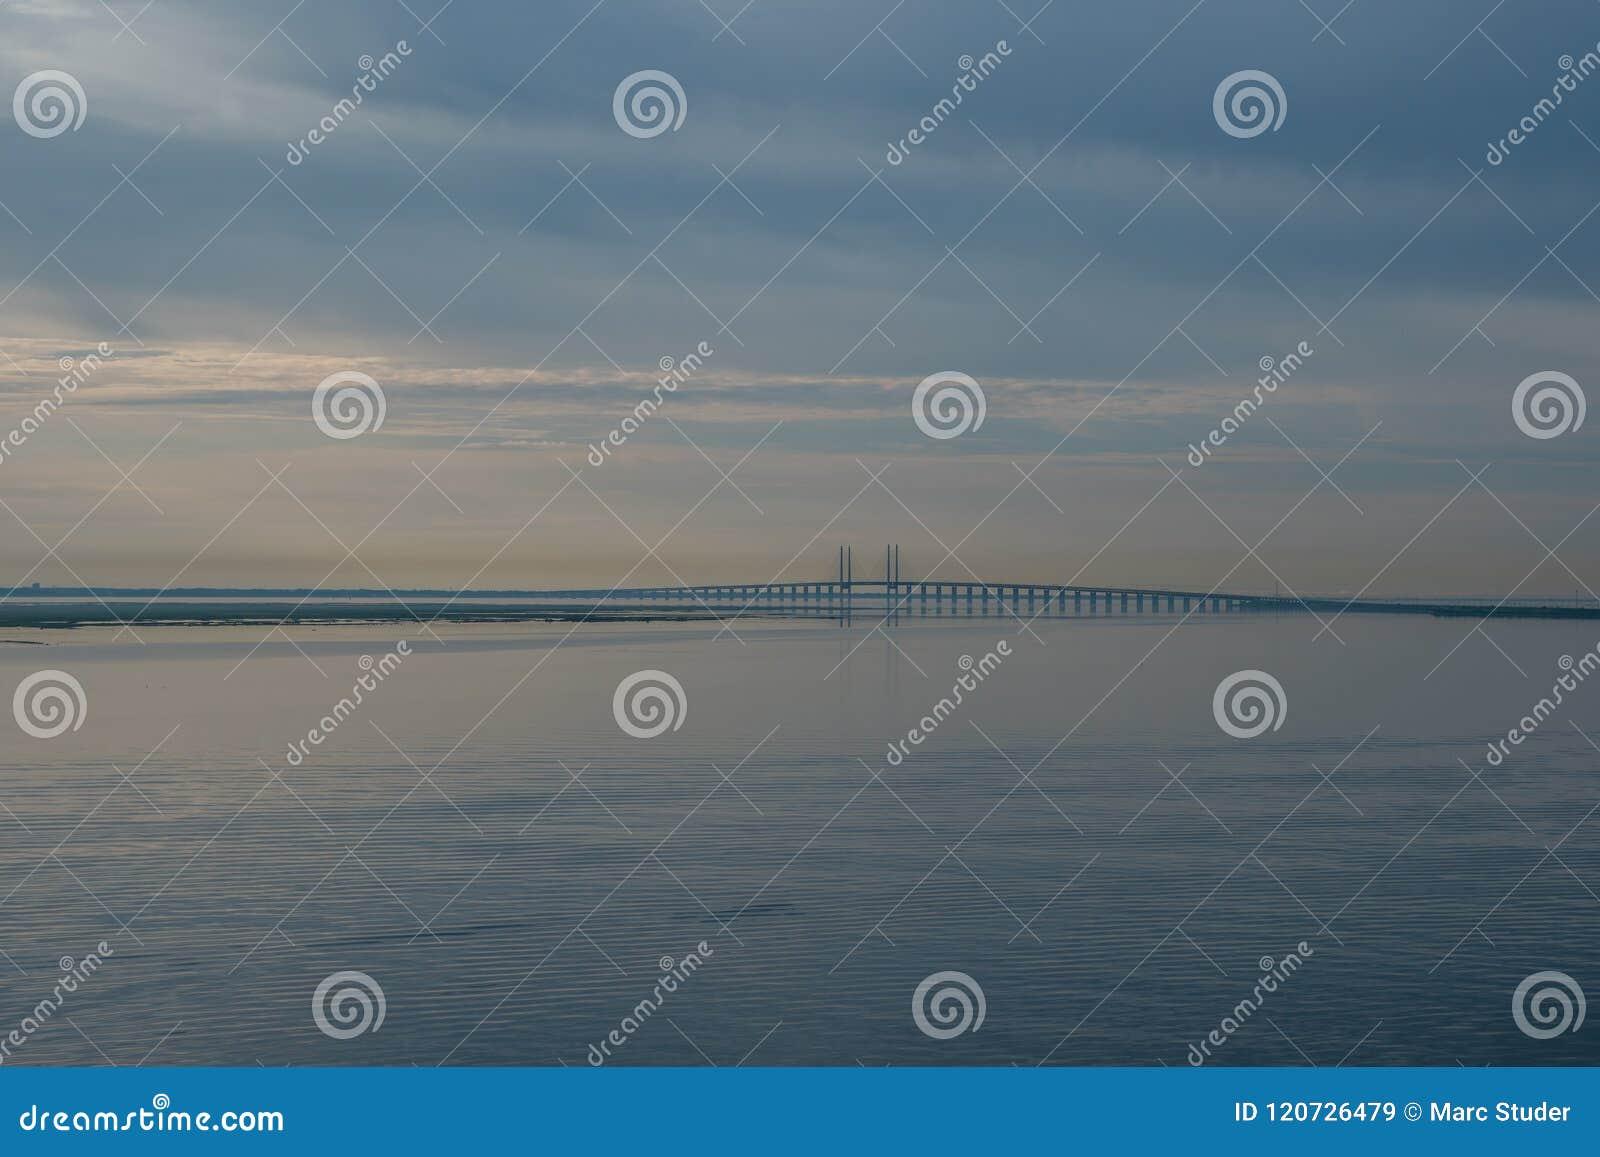 Oresund bridge in Denmark during sunrise seen from curiseship